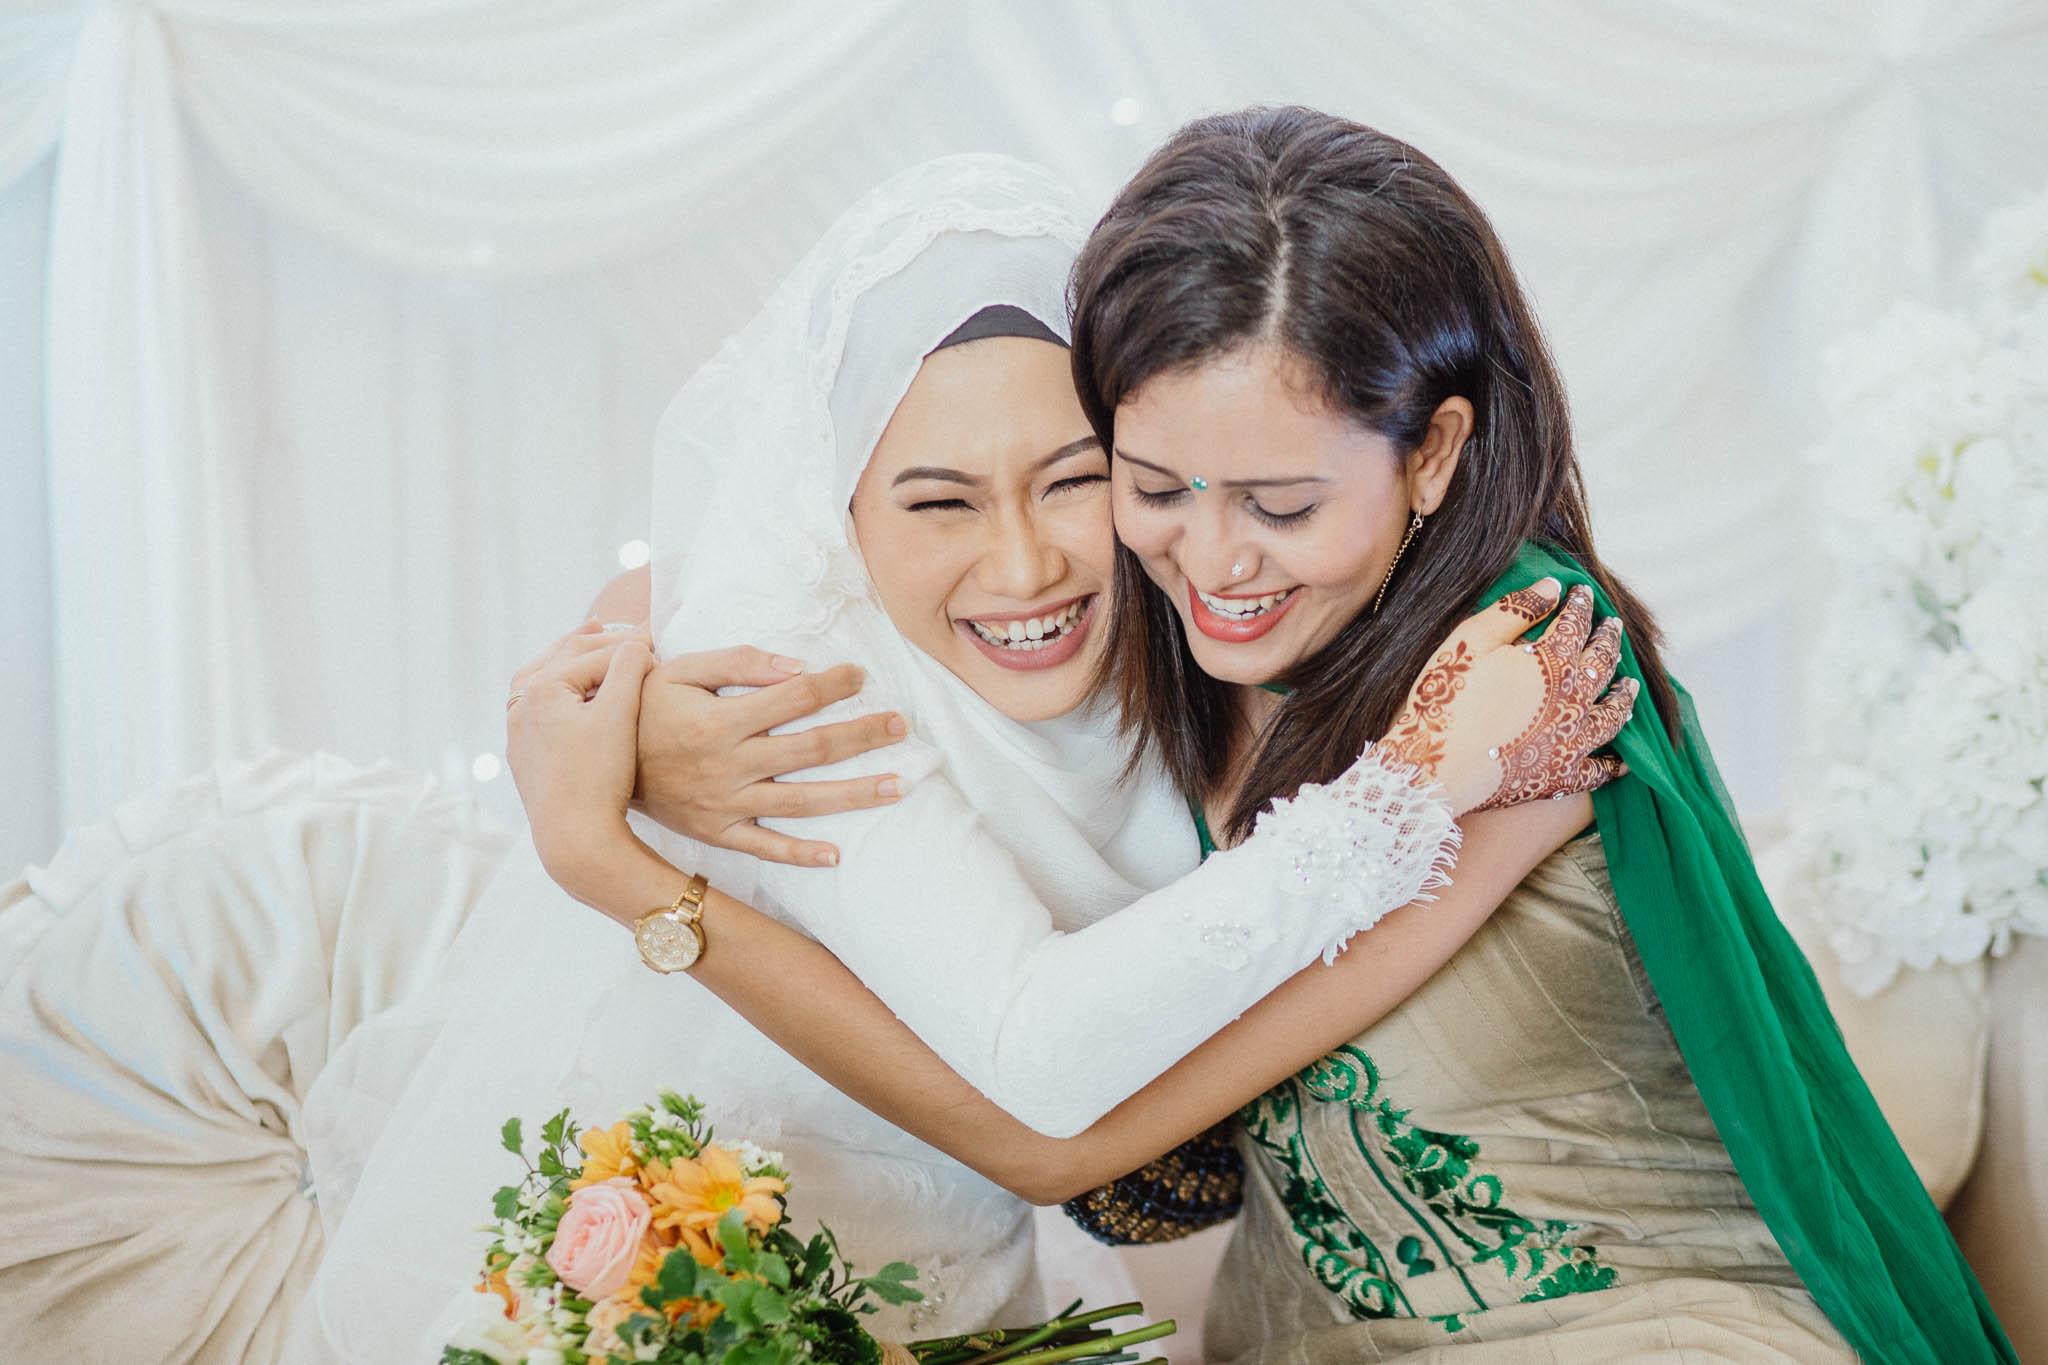 singapore-wedding-photographer-addafiq-nufail-033.jpg